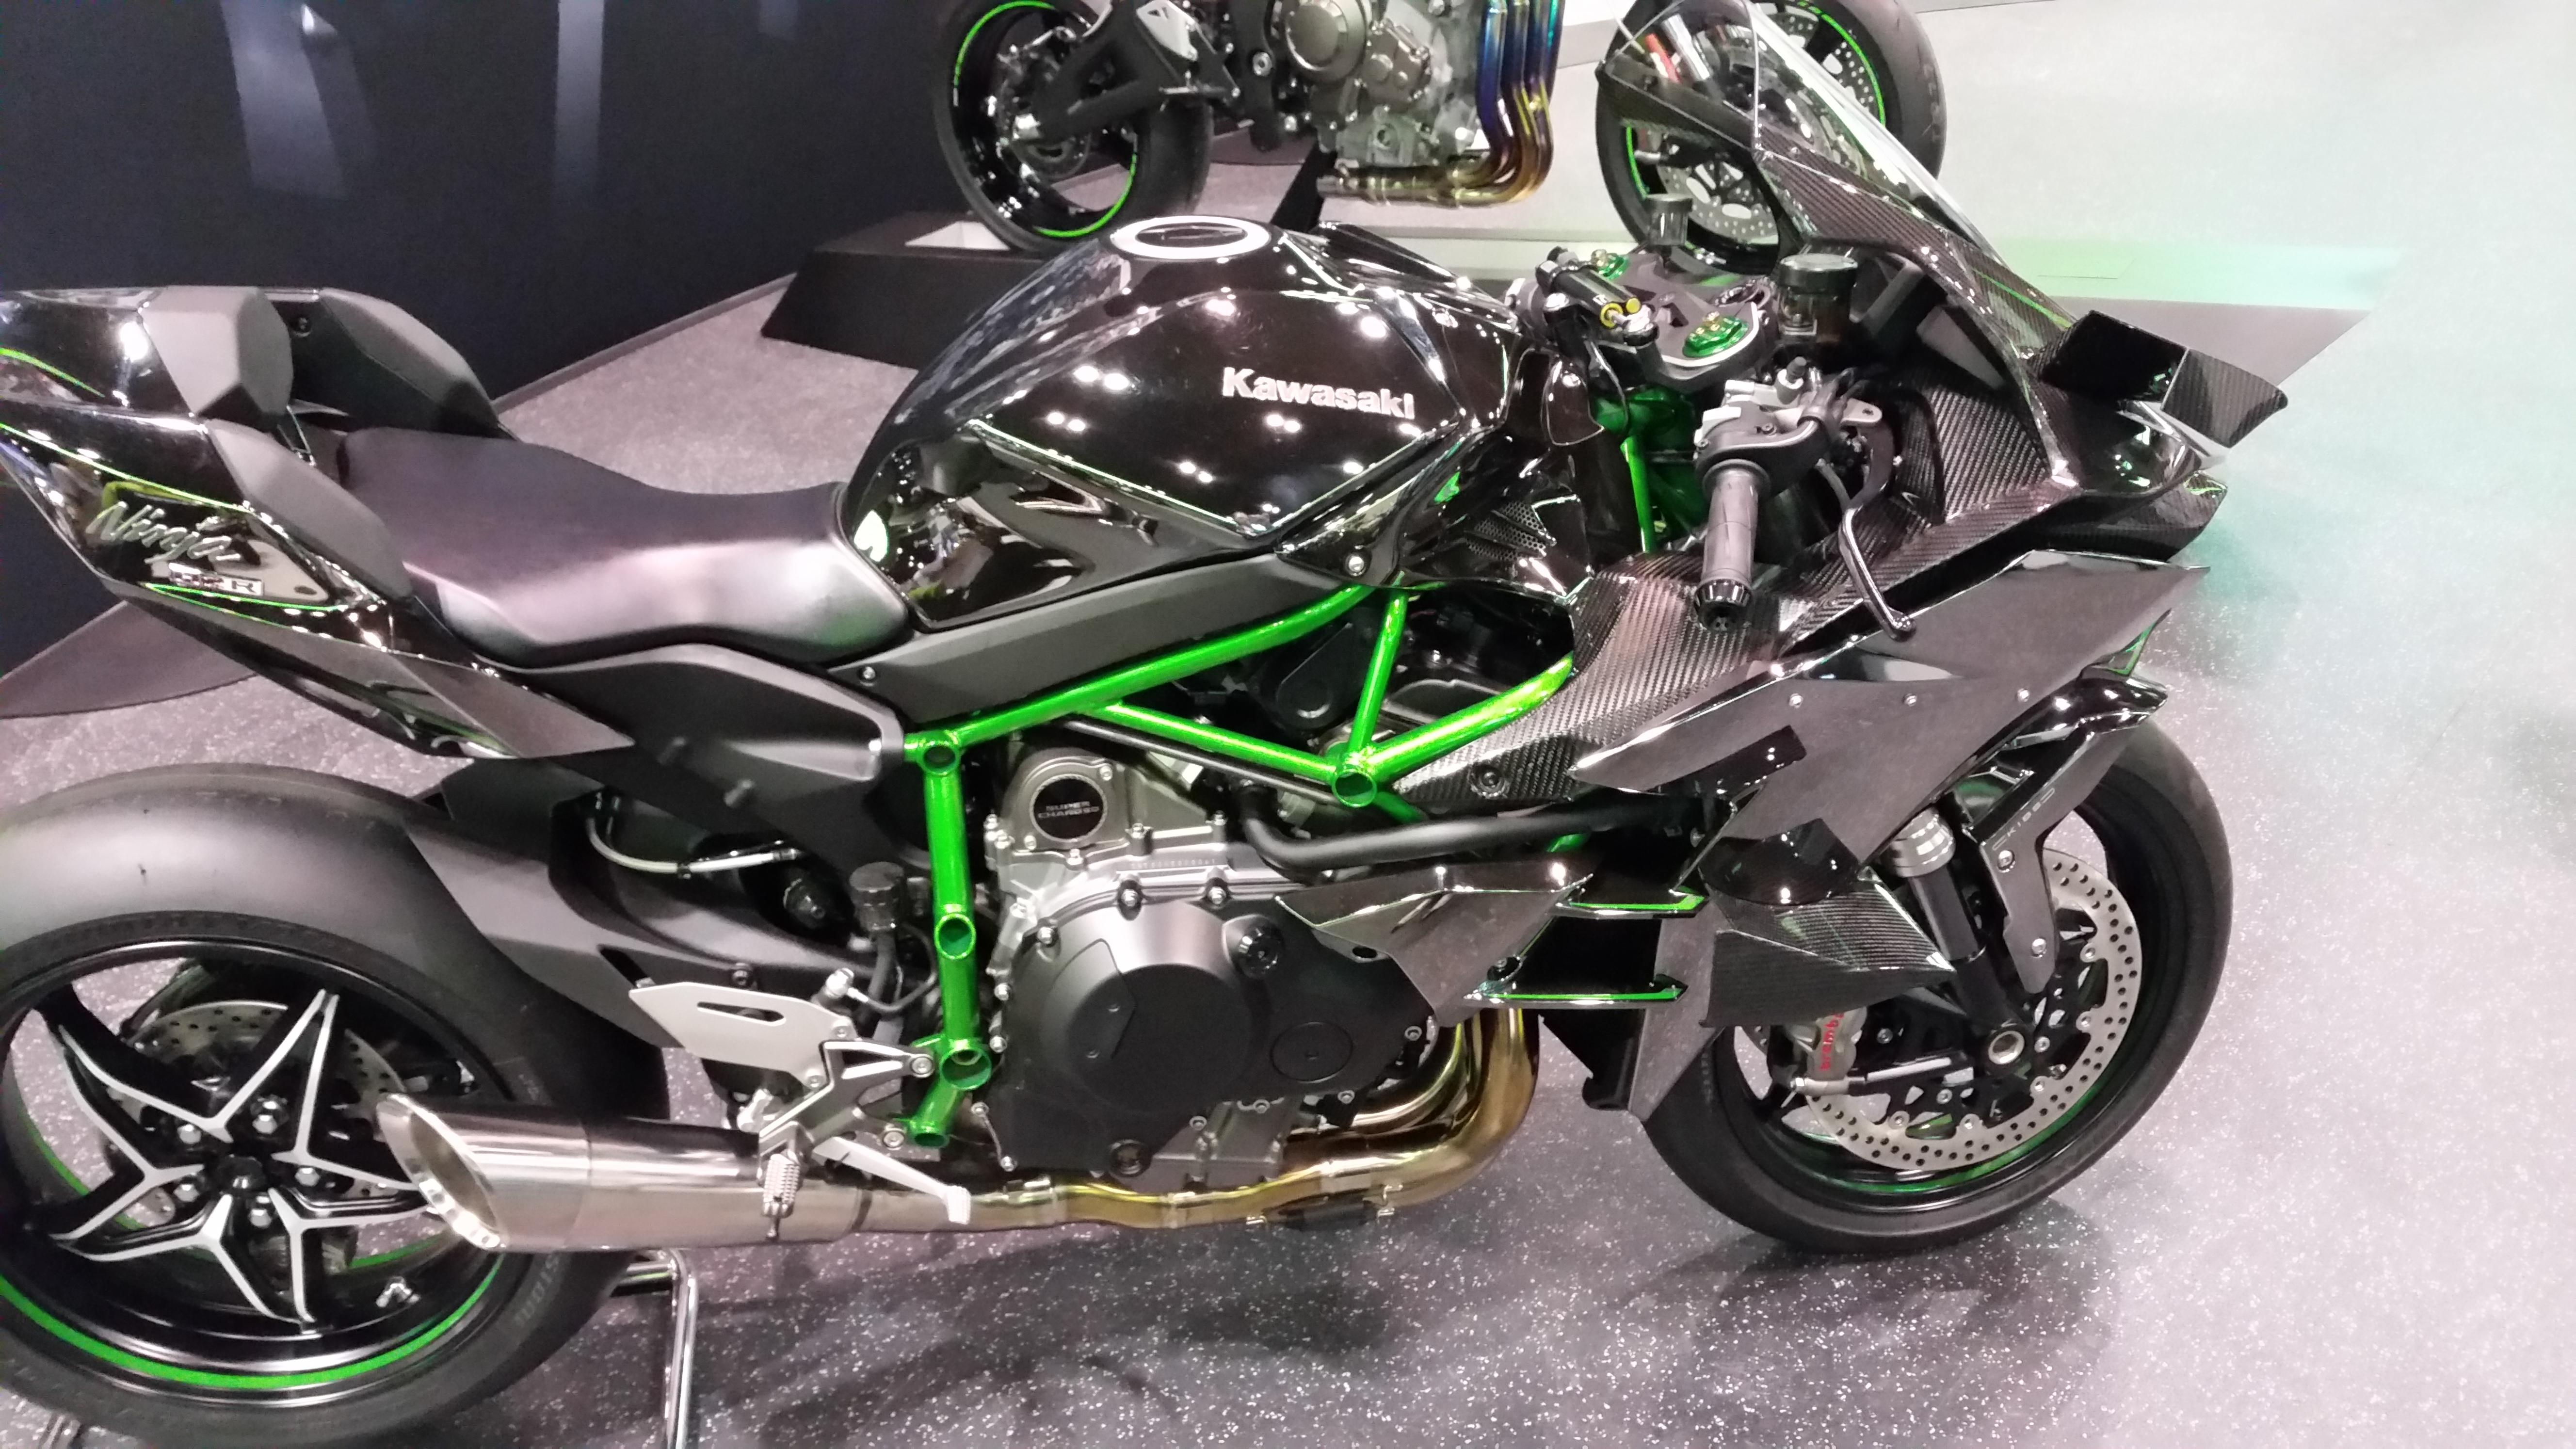 2016 Kawasaki Ninja ZS-6 Street Edition